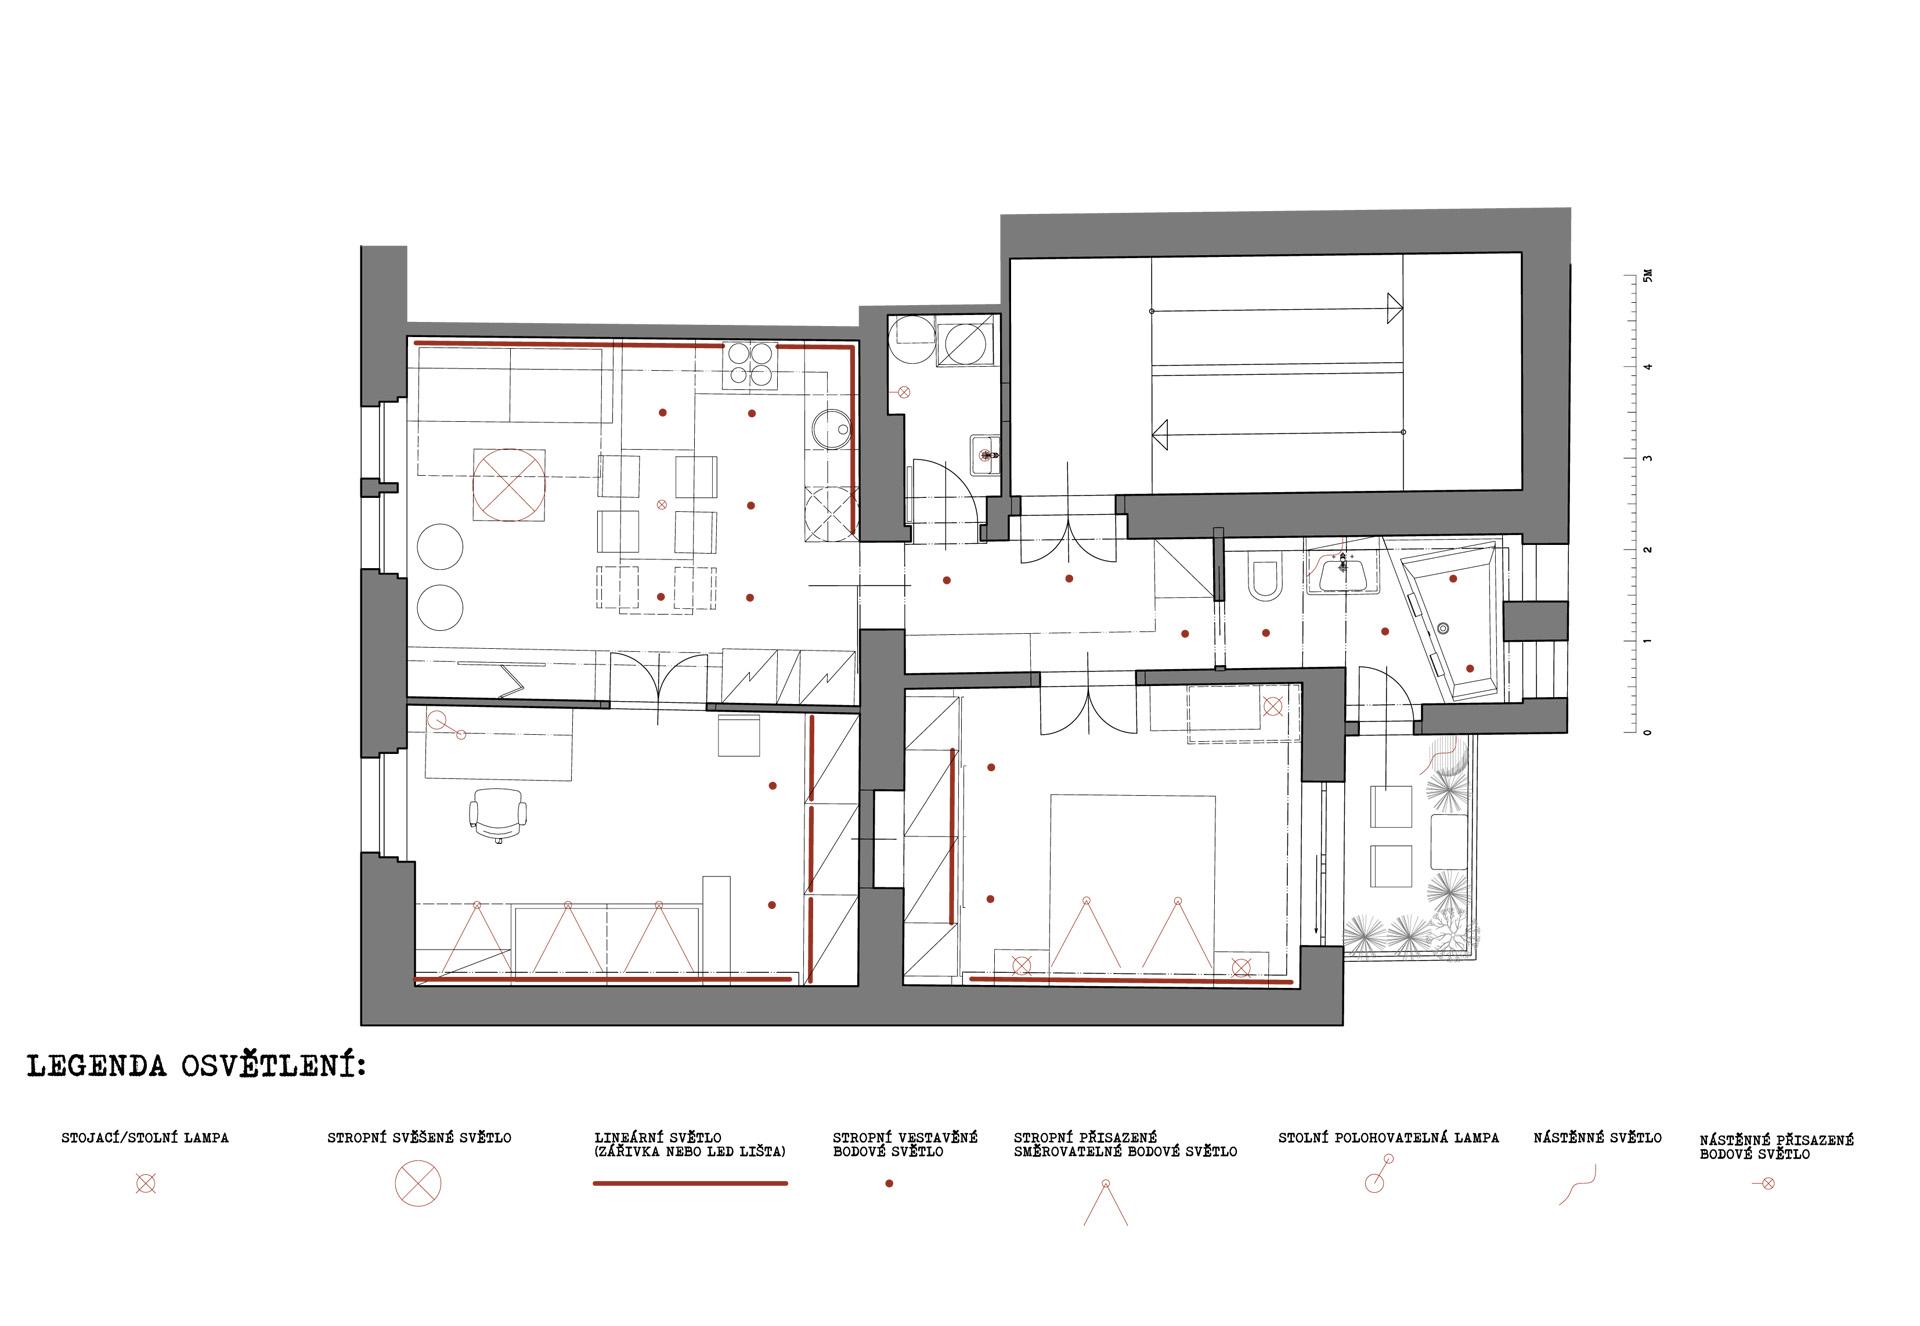 rekonstrukce bytu-Praha Břevnov - půdorys - návrh